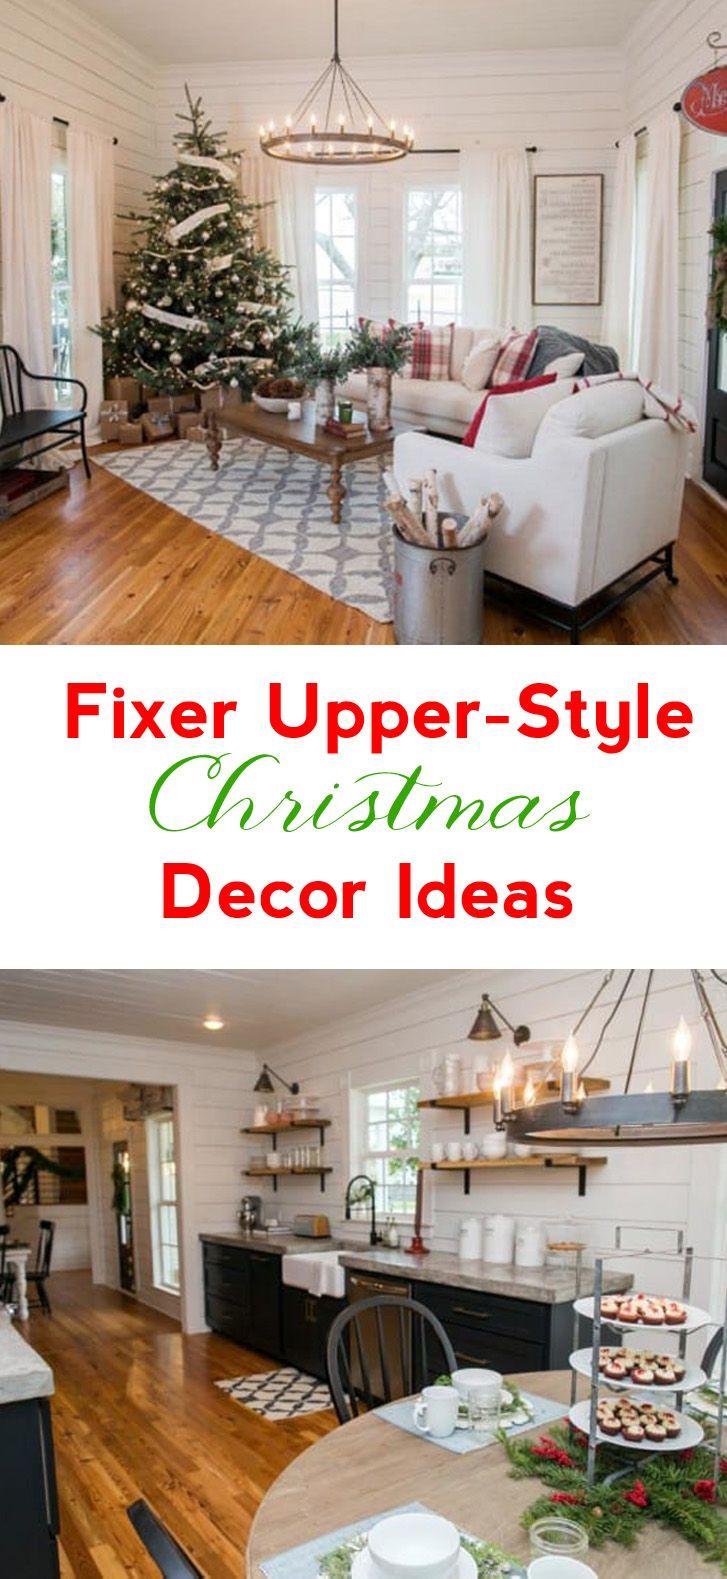 Best 25 Fixer Upper Kitchen Ideas On Pinterest Open